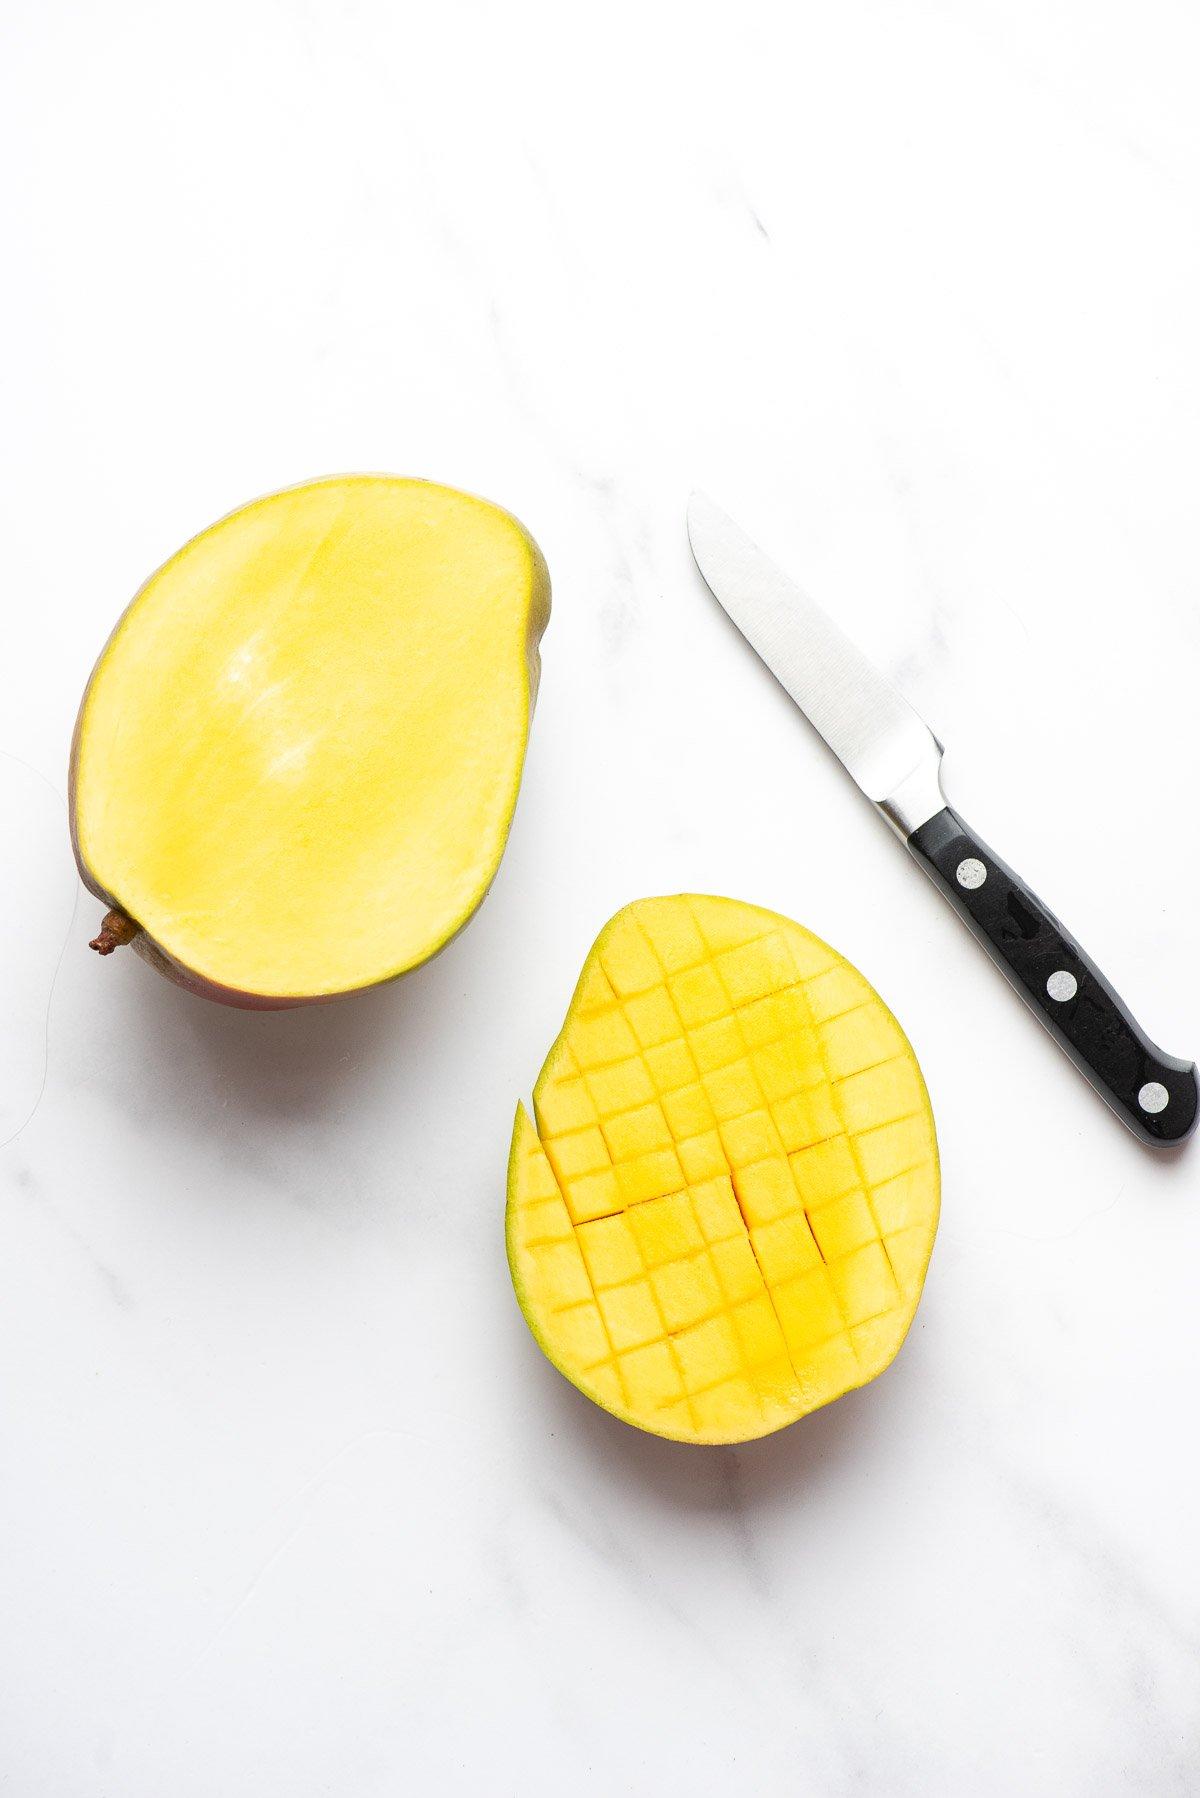 cut side of mango with scored fruit